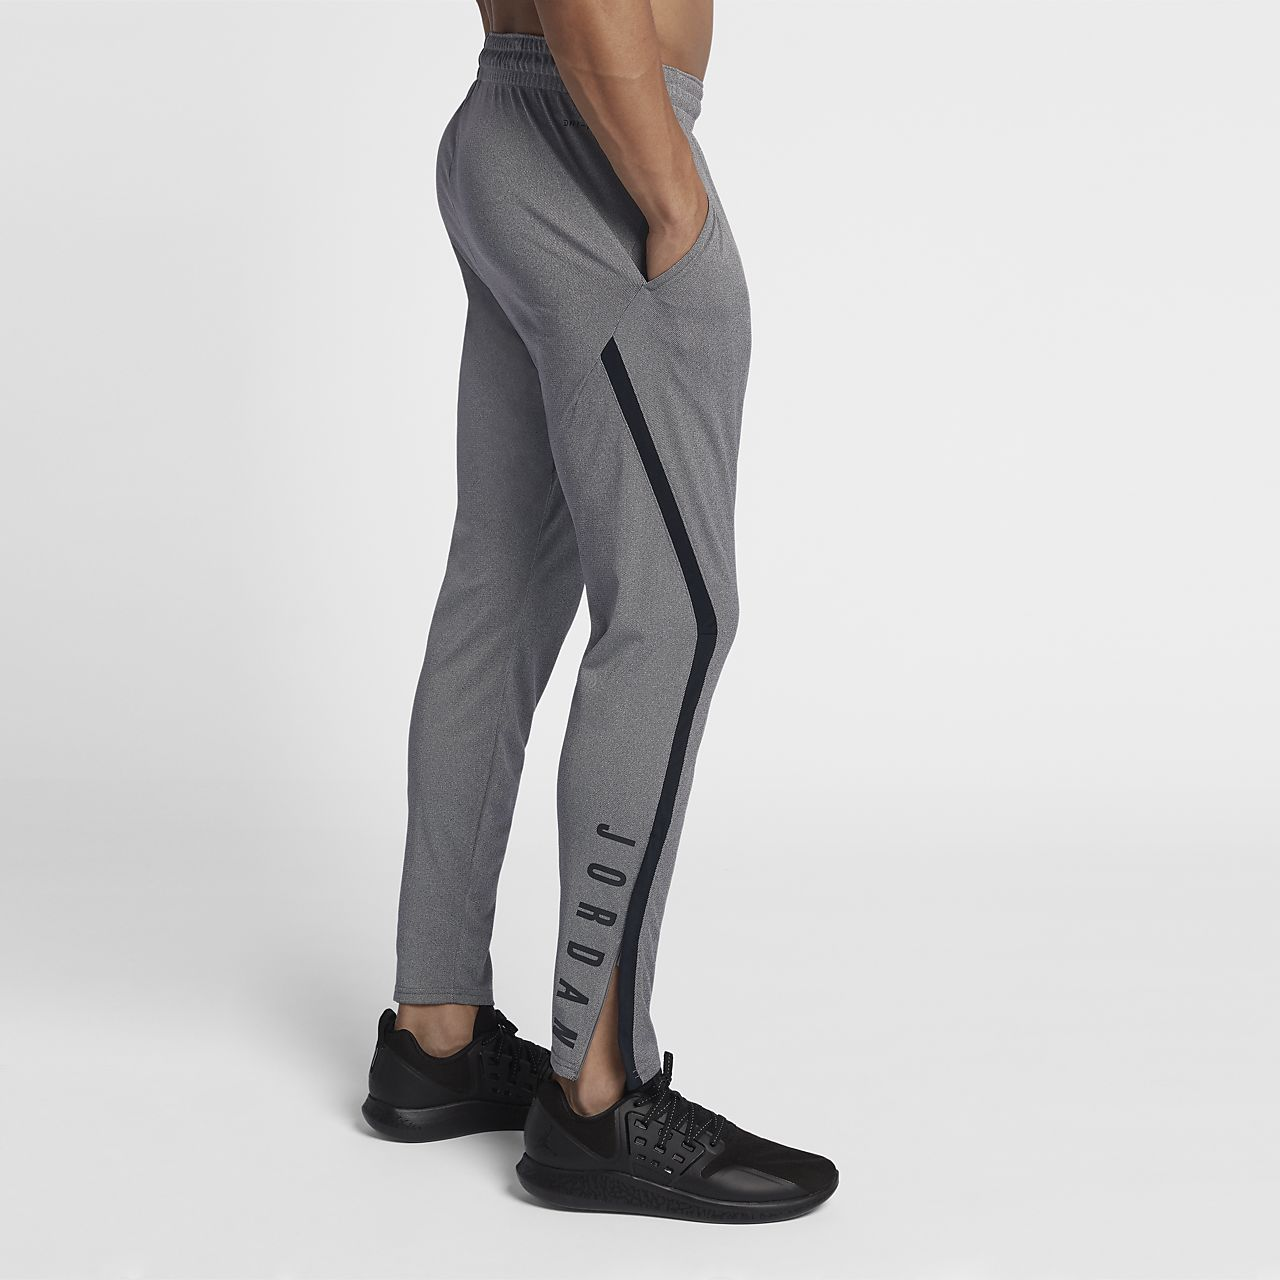 basketball trousers fashionable pant - HD1280×1280